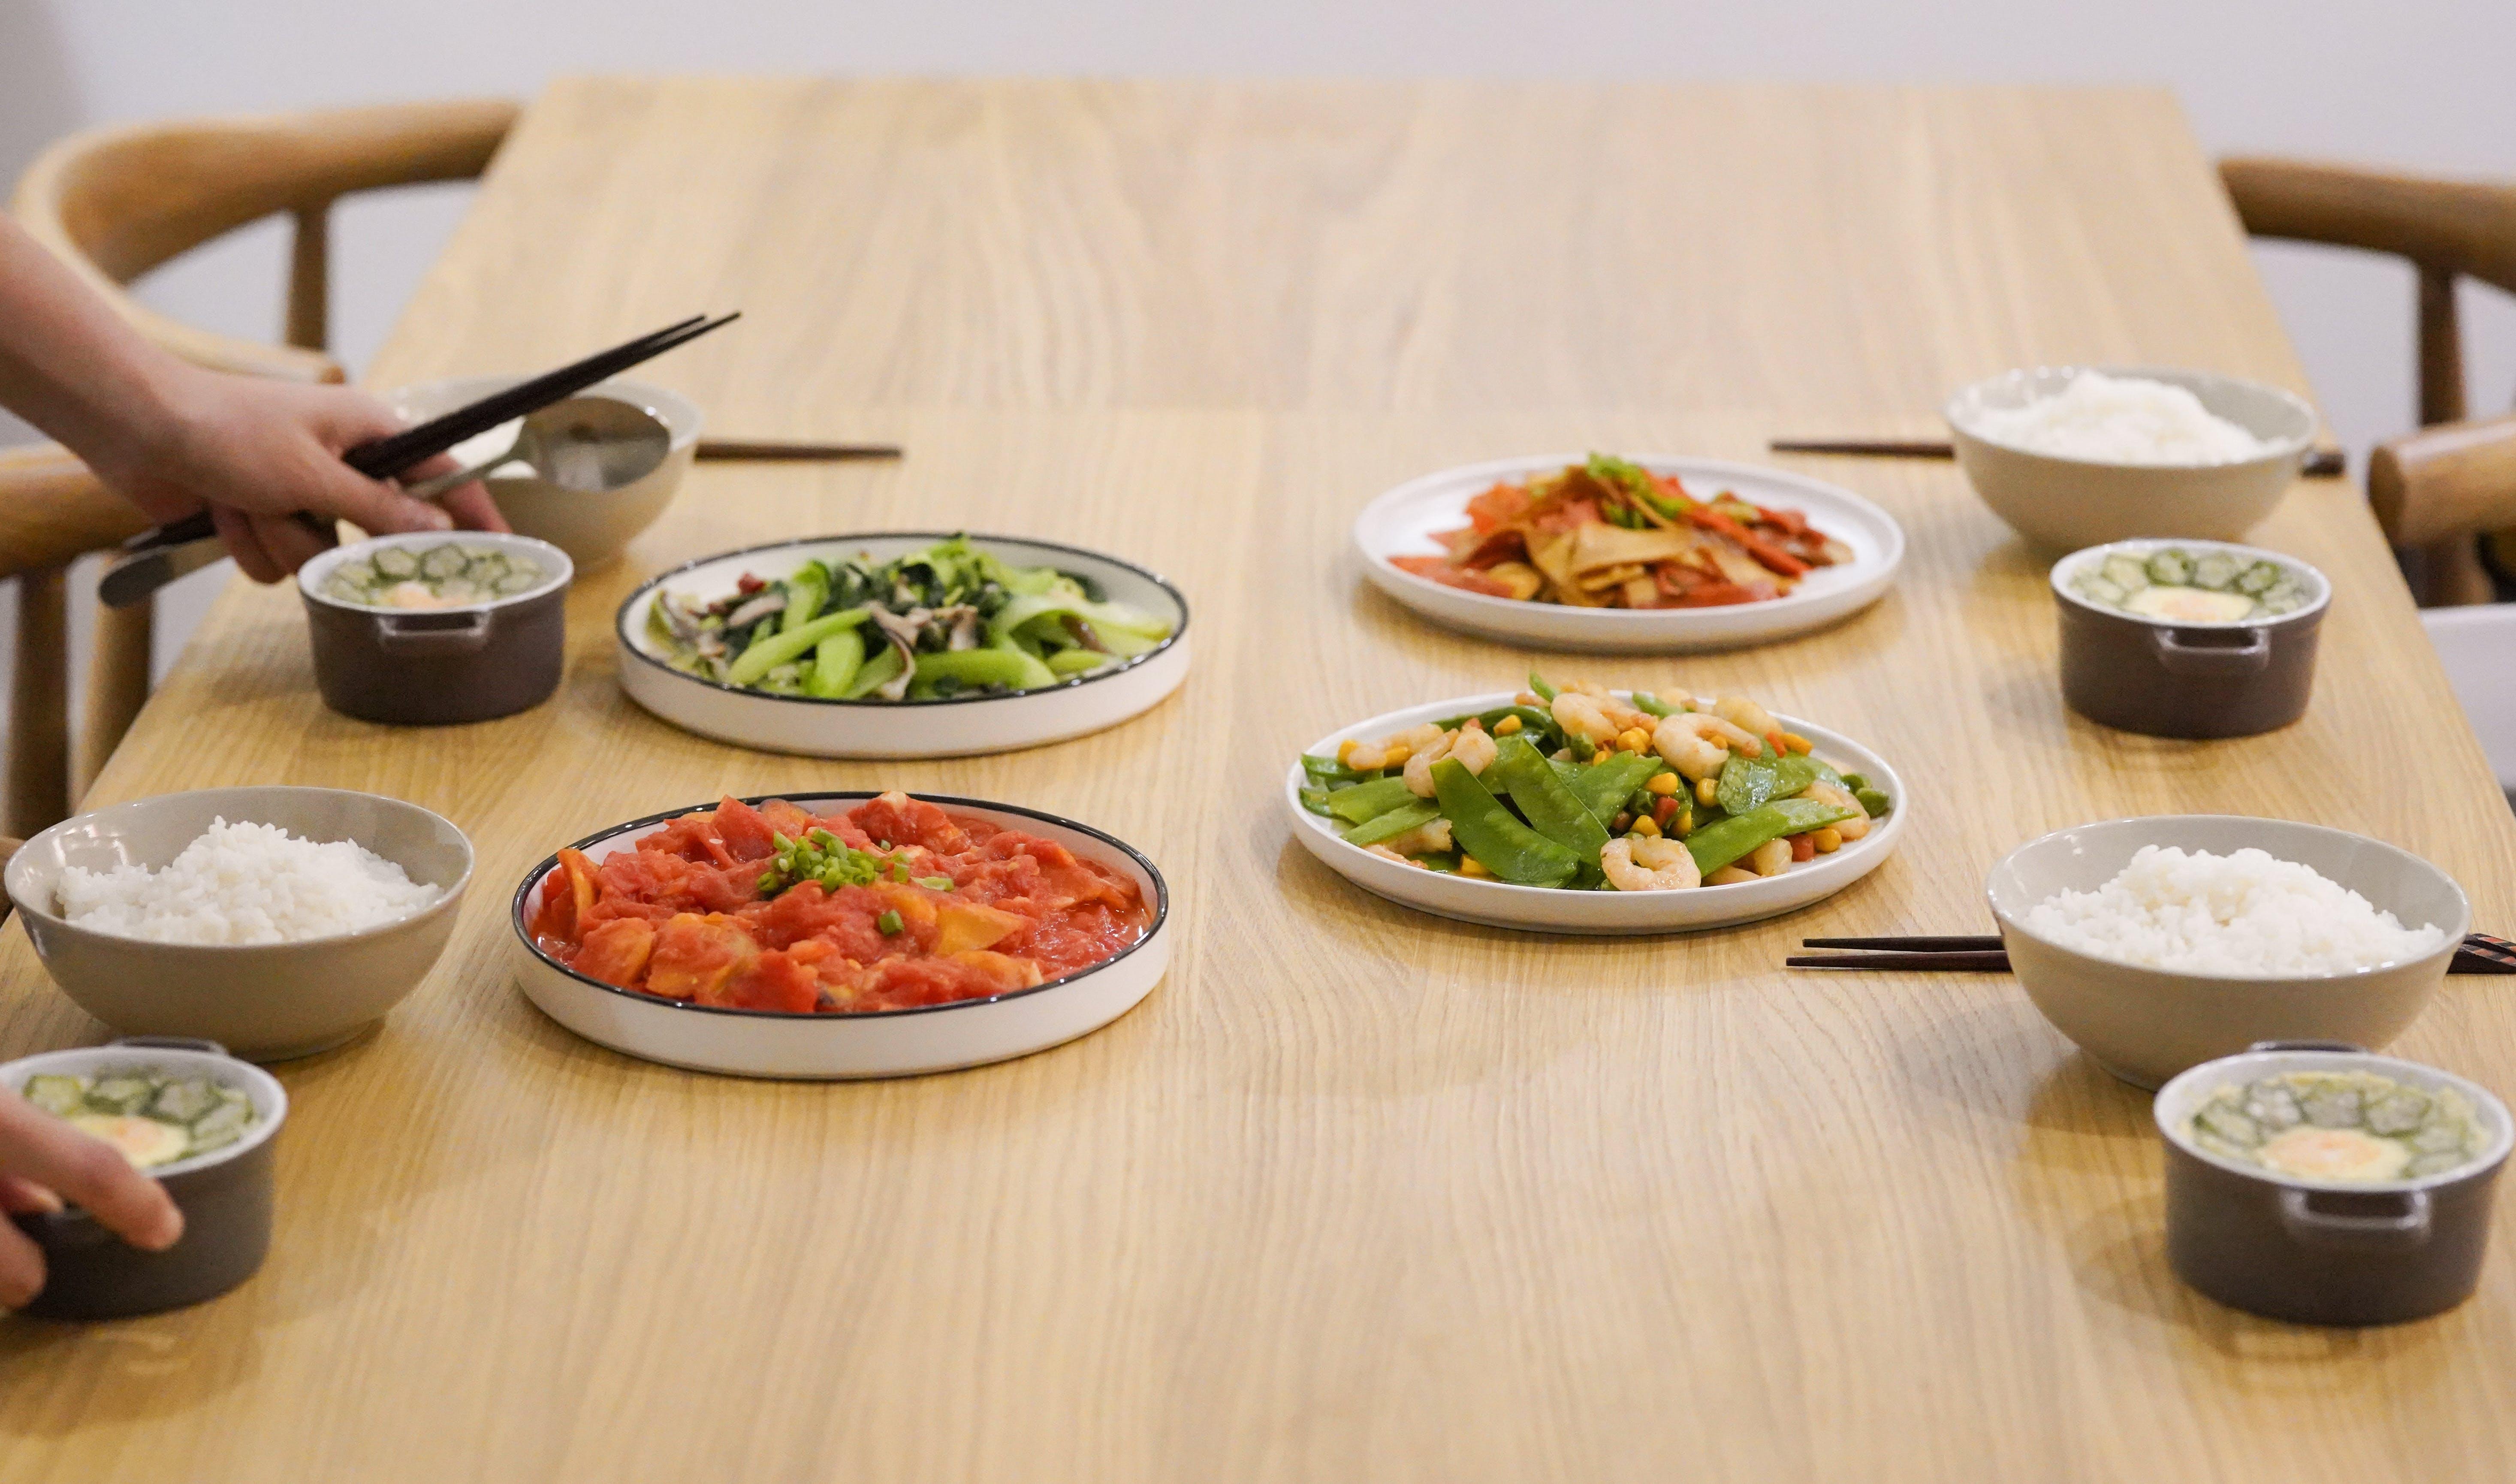 Gratis arkivbilde med bolle, bord, delikat, frokost